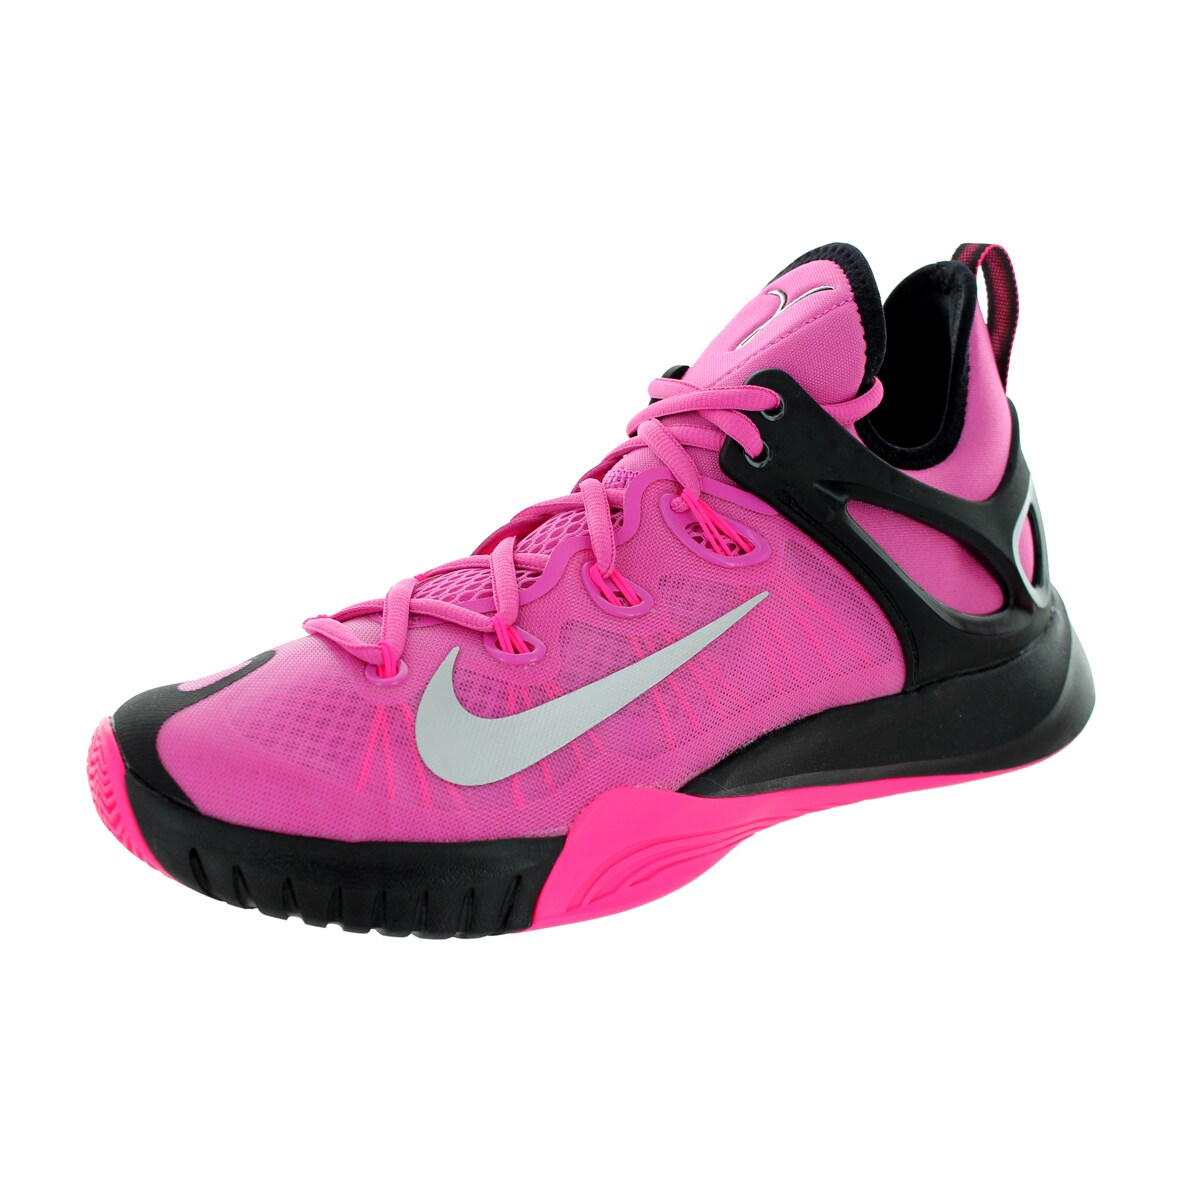 fcbbcf7734e49 ... greece shop nike mens zoom hyperrev 2015 pinkfr i metallic silver pink  bl basketball shoe free